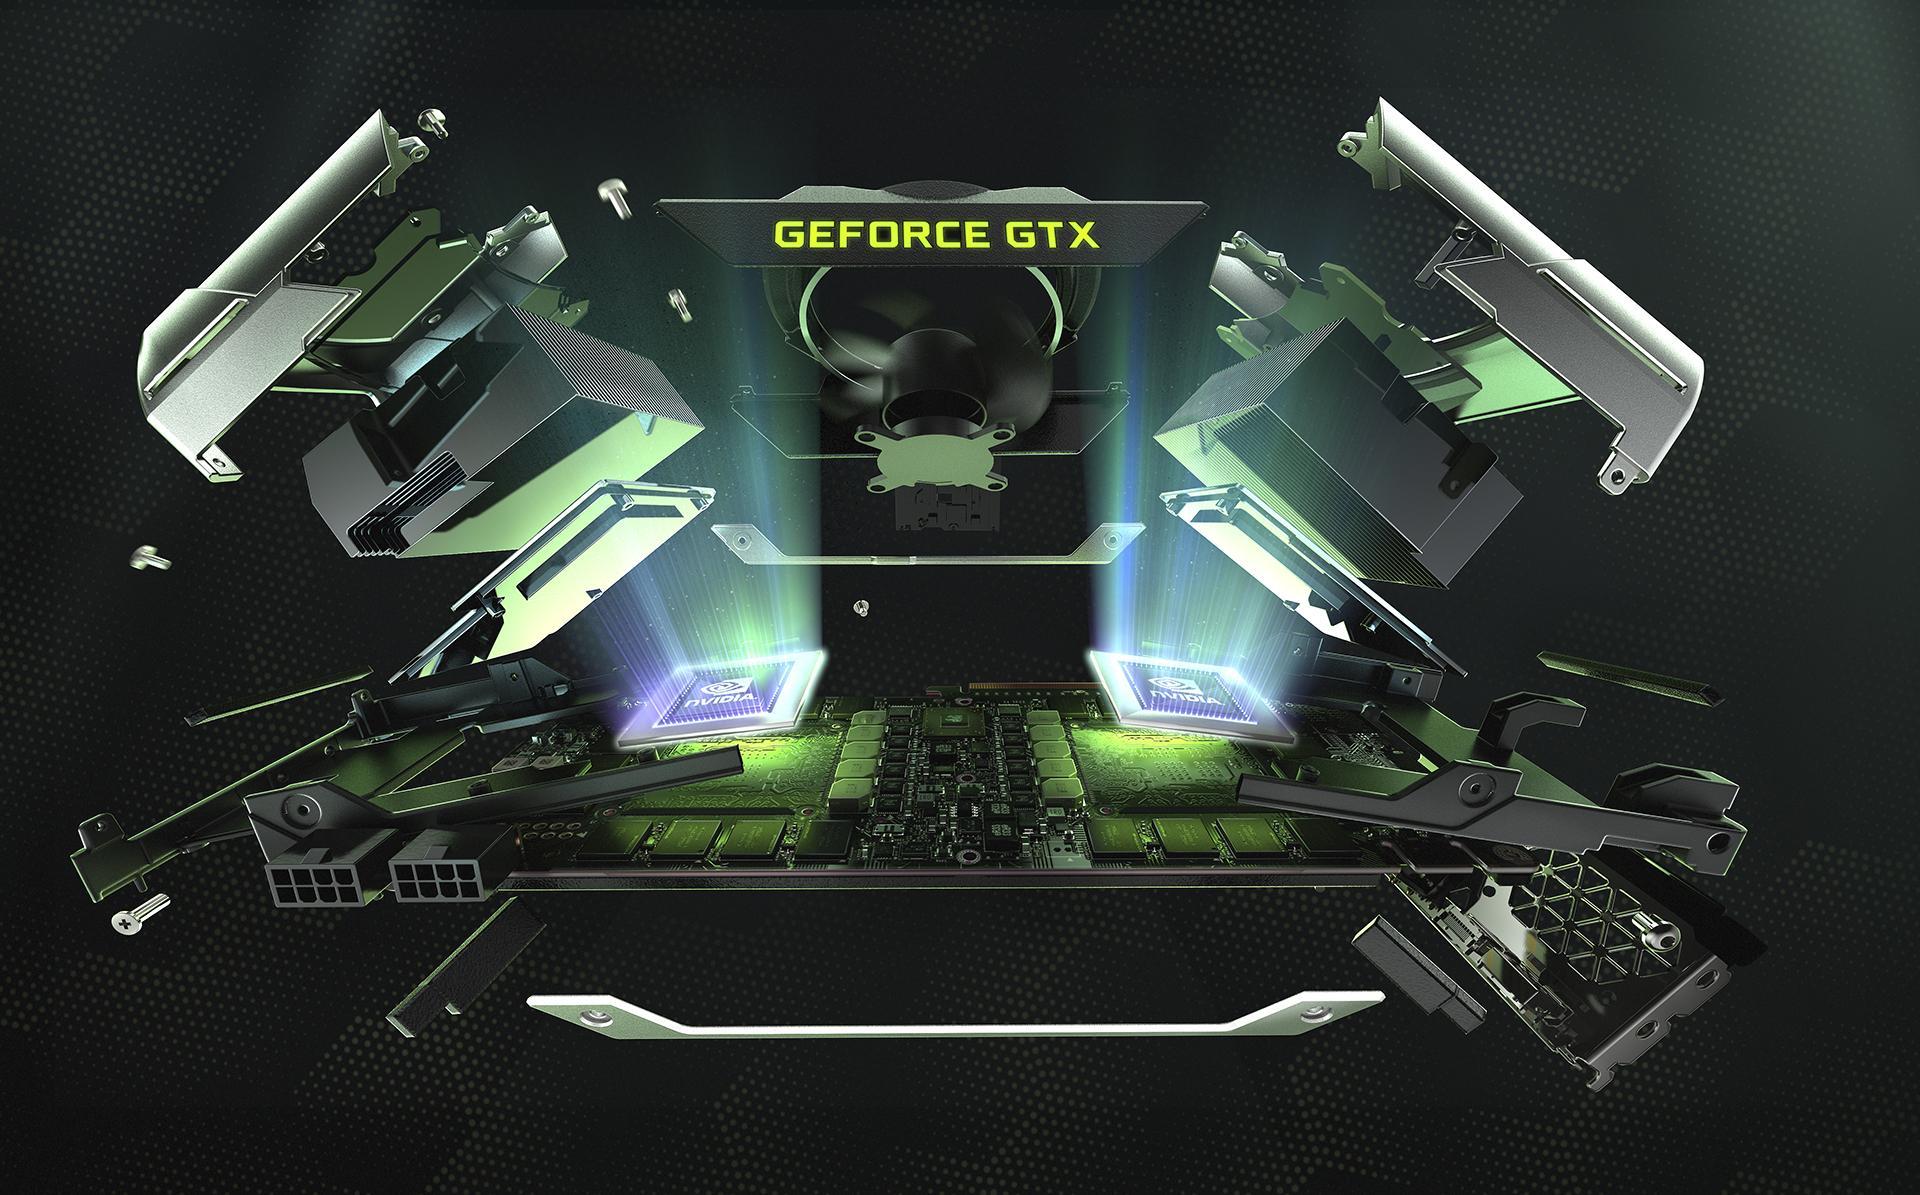 GF_GTX_Titan_Z_Exploded_fullbg